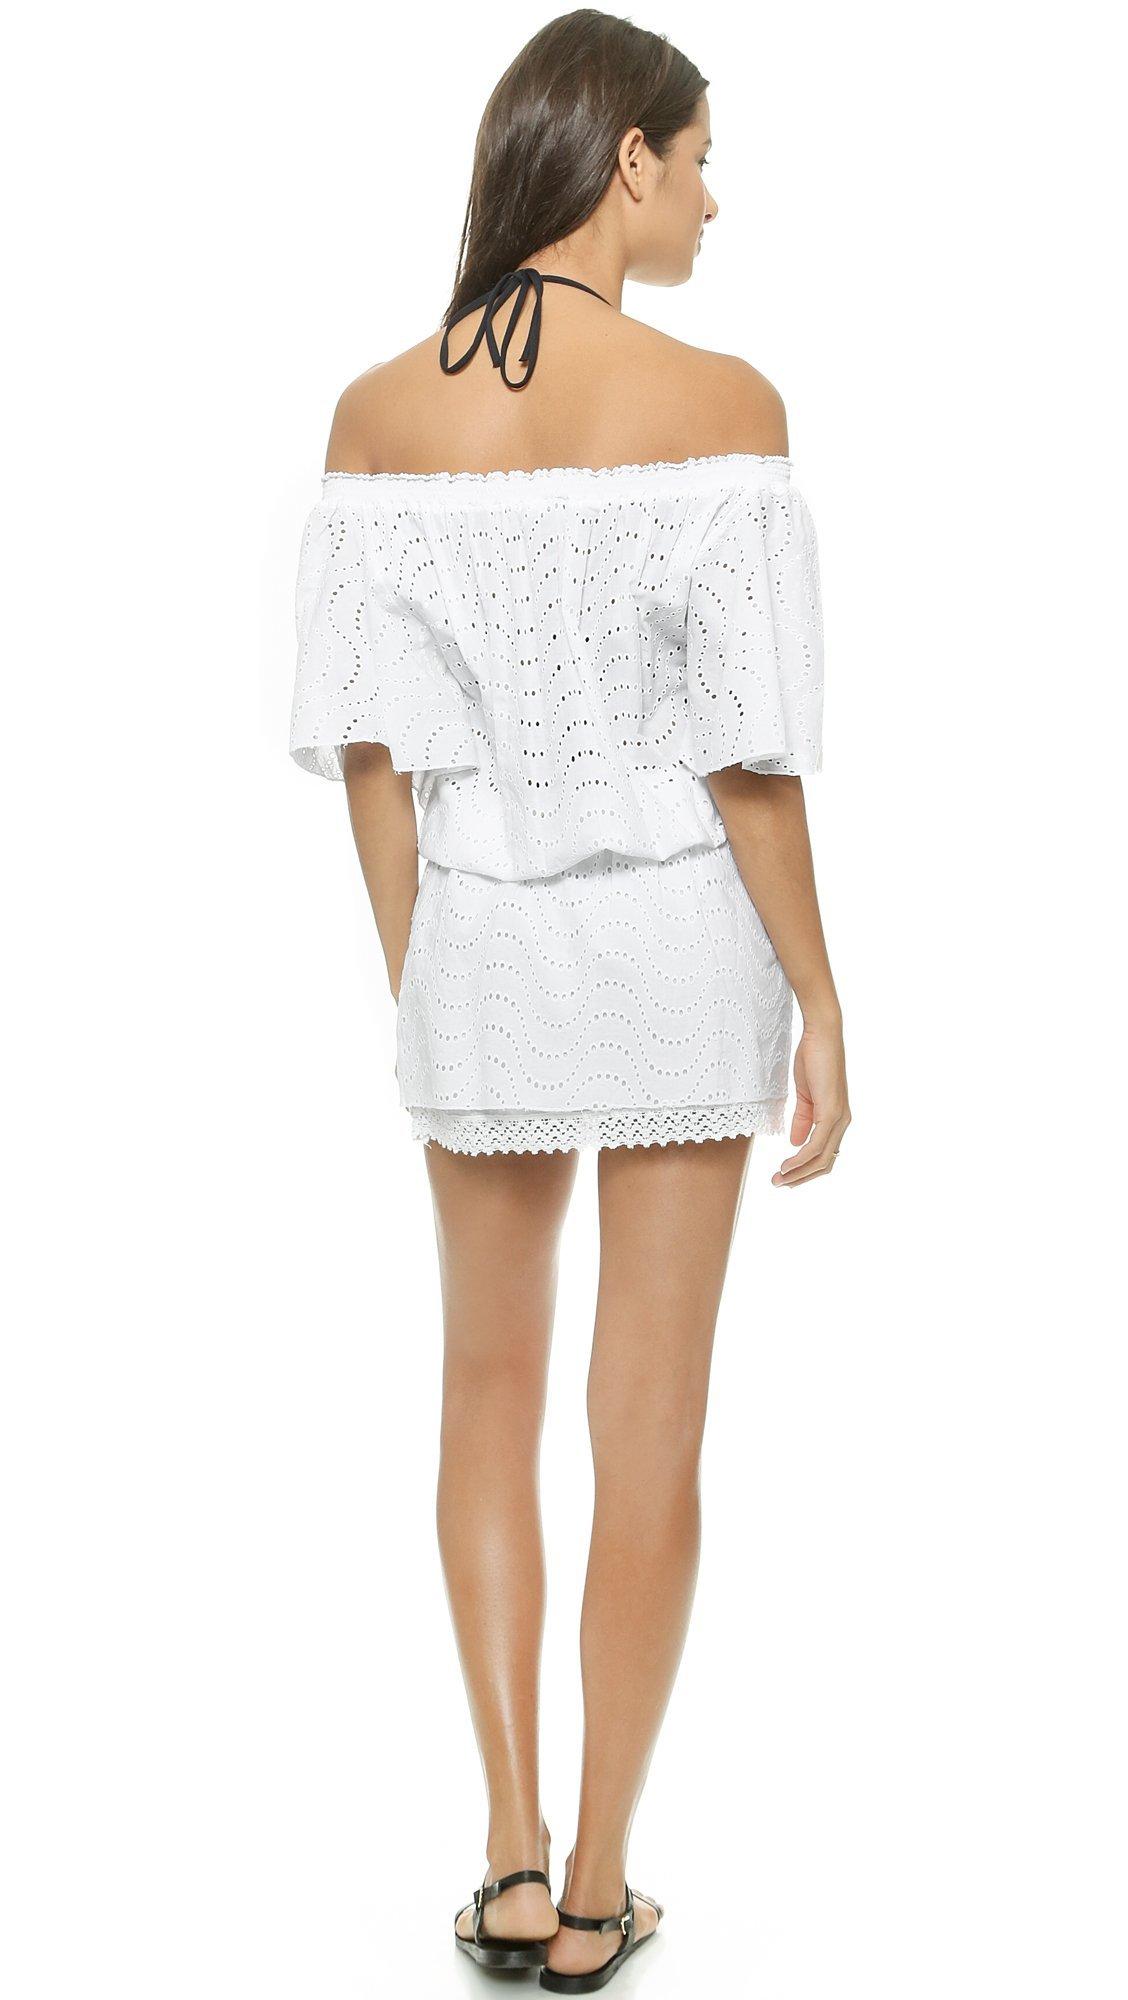 Melissa Odabash Women's Michea Cover Up Dress, White, Small by Melissa Odabash (Image #3)